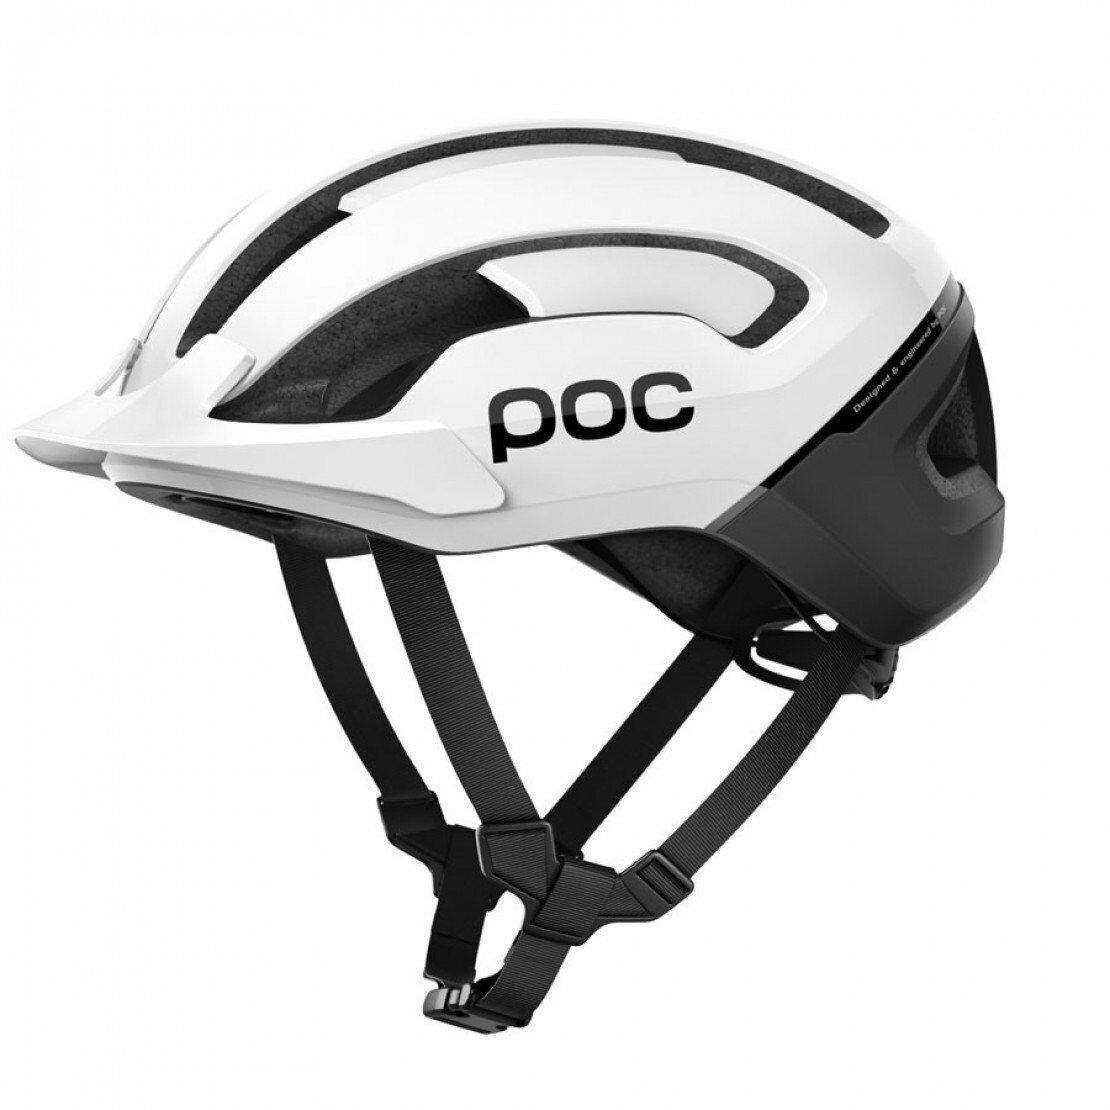 Шолом велосипедний POC Omne Air Resistance SPIN S 50-56 Hydrogen White